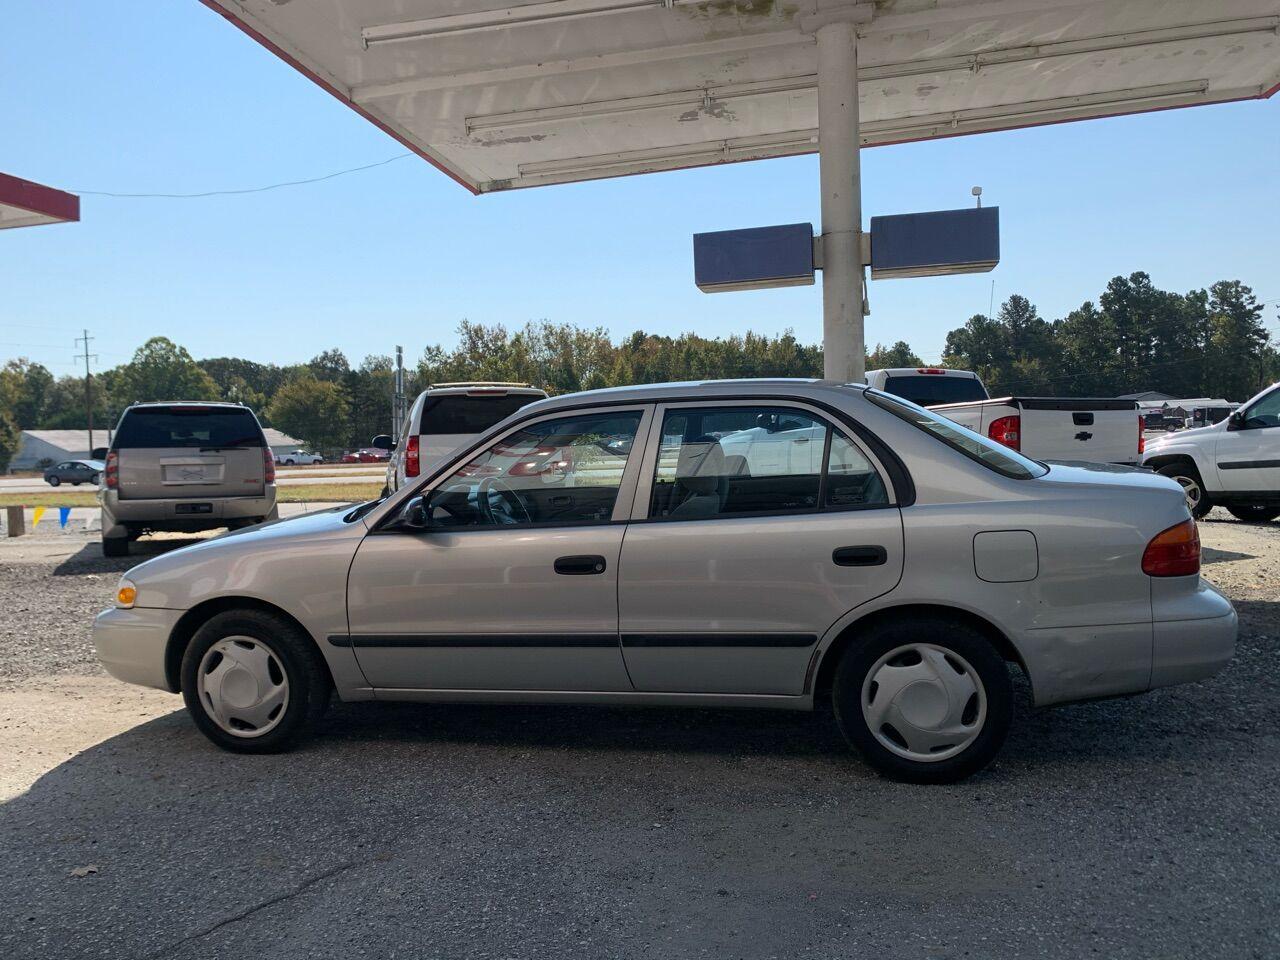 ChevroletPrizm8